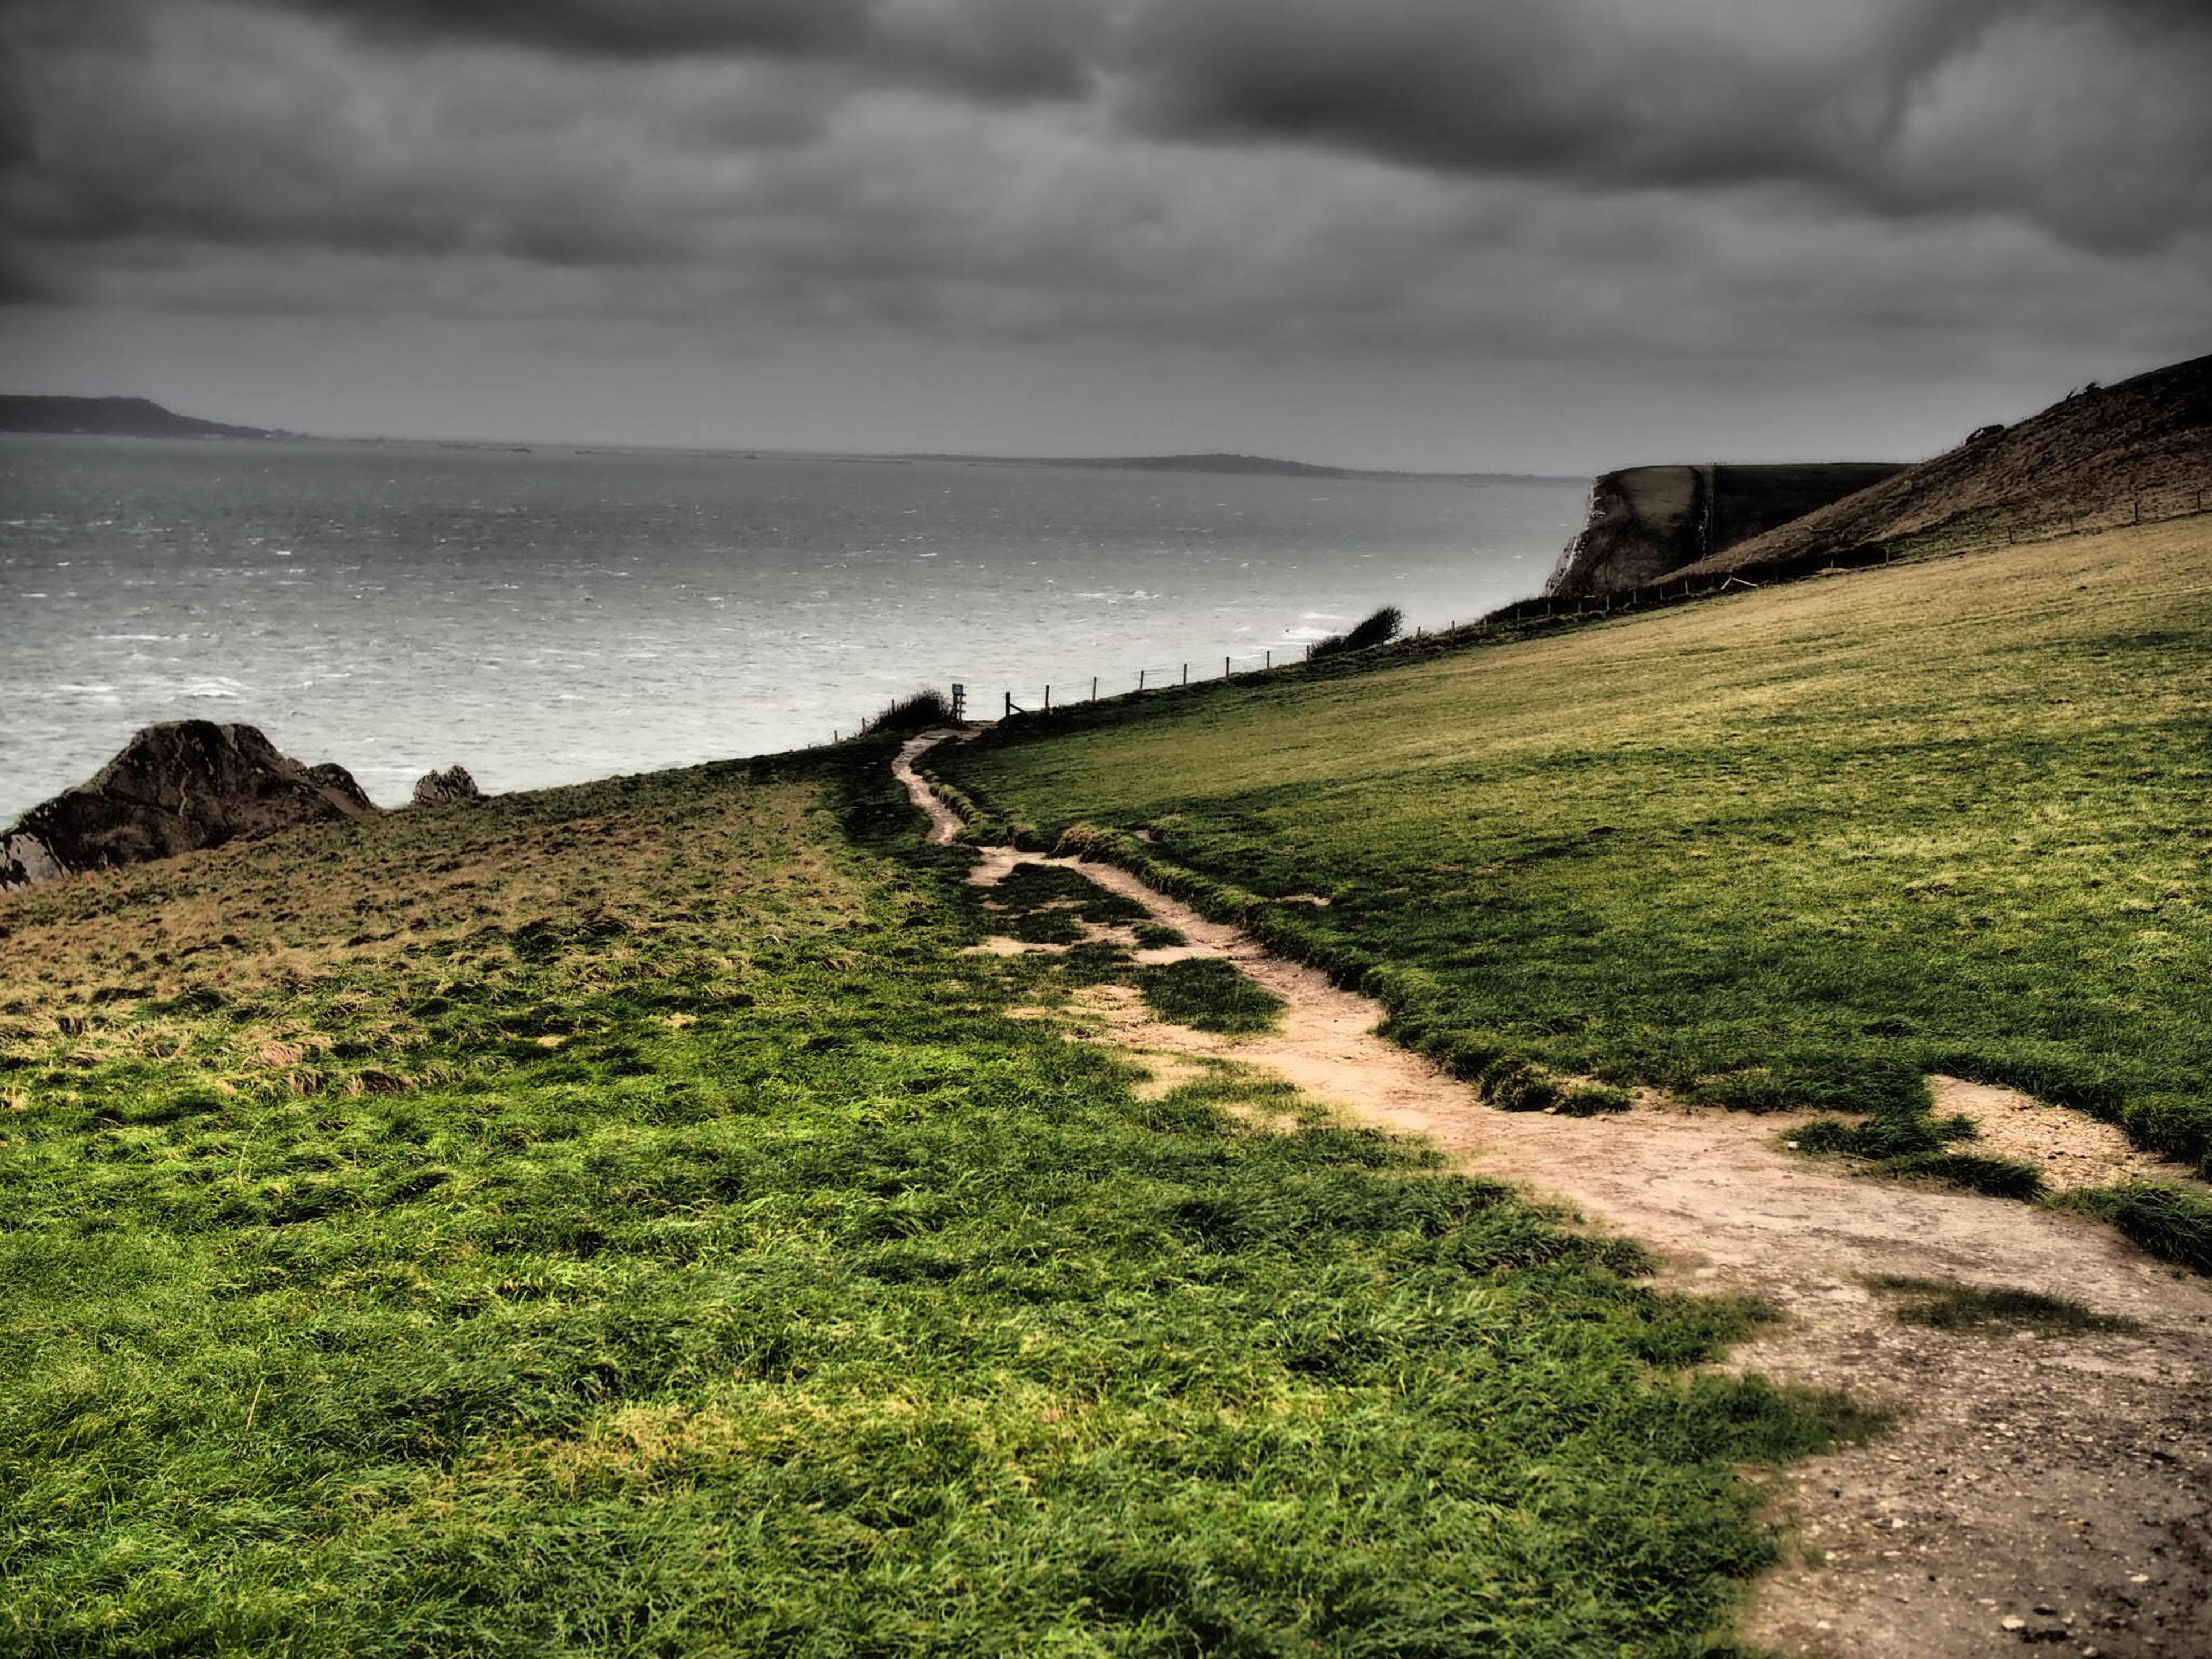 sky, grass, tranquil scene, tranquility, sea, horizon over water, scenics, cloud - sky, beauty in nature, nature, landscape, water, cloud, cloudy, beach, field, remote, grassy, idyllic, non-urban scene